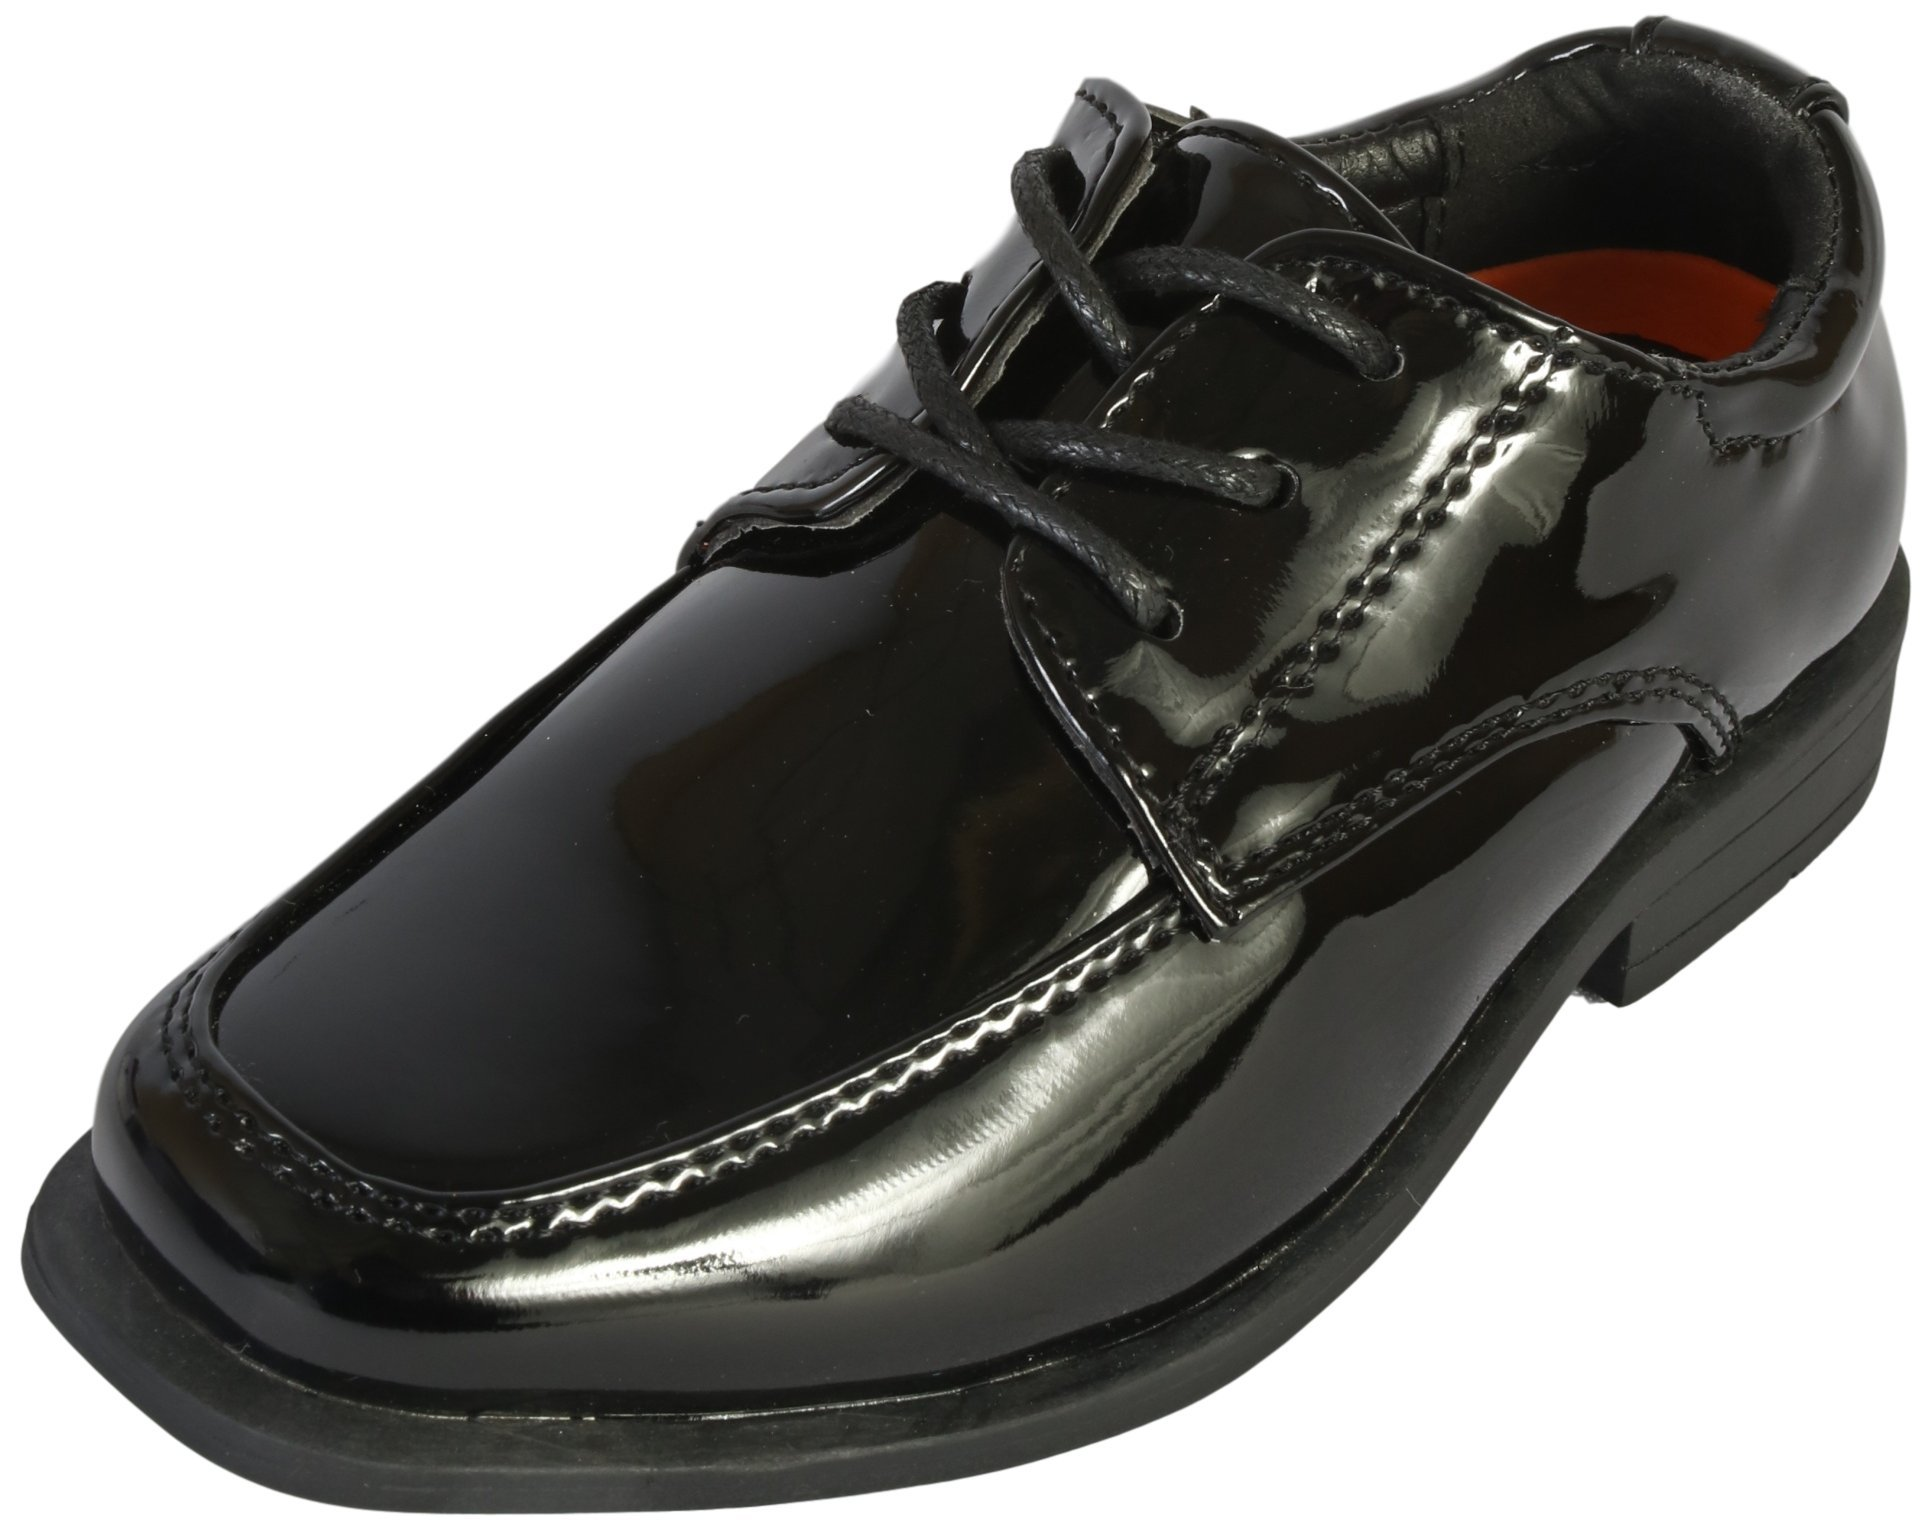 Jodano Collection Boys Memory Foam Lace up Dress Shoe, Black Patent, 11 M US Little Kid'